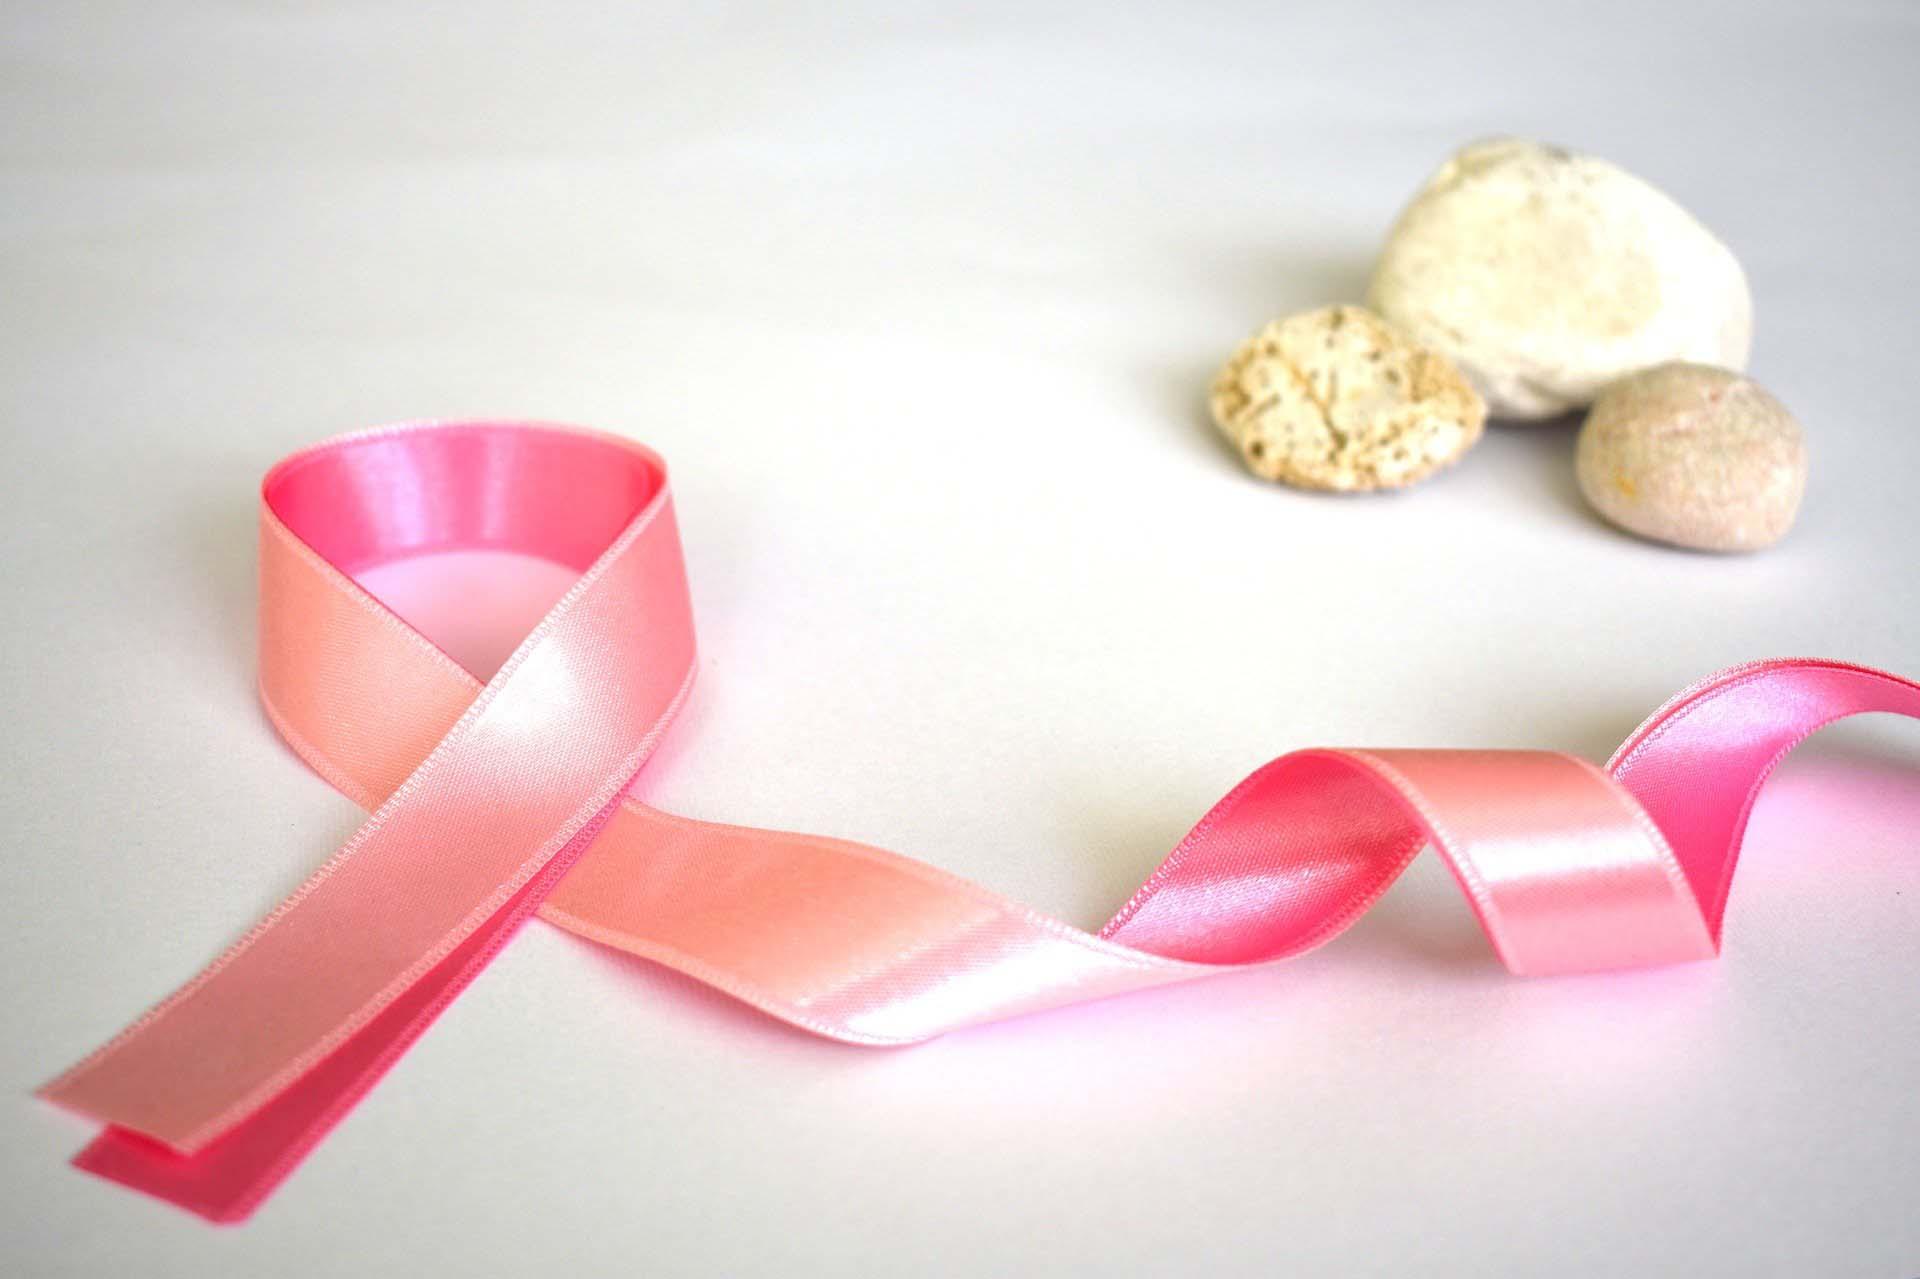 pink-ribbon-3715345_1920